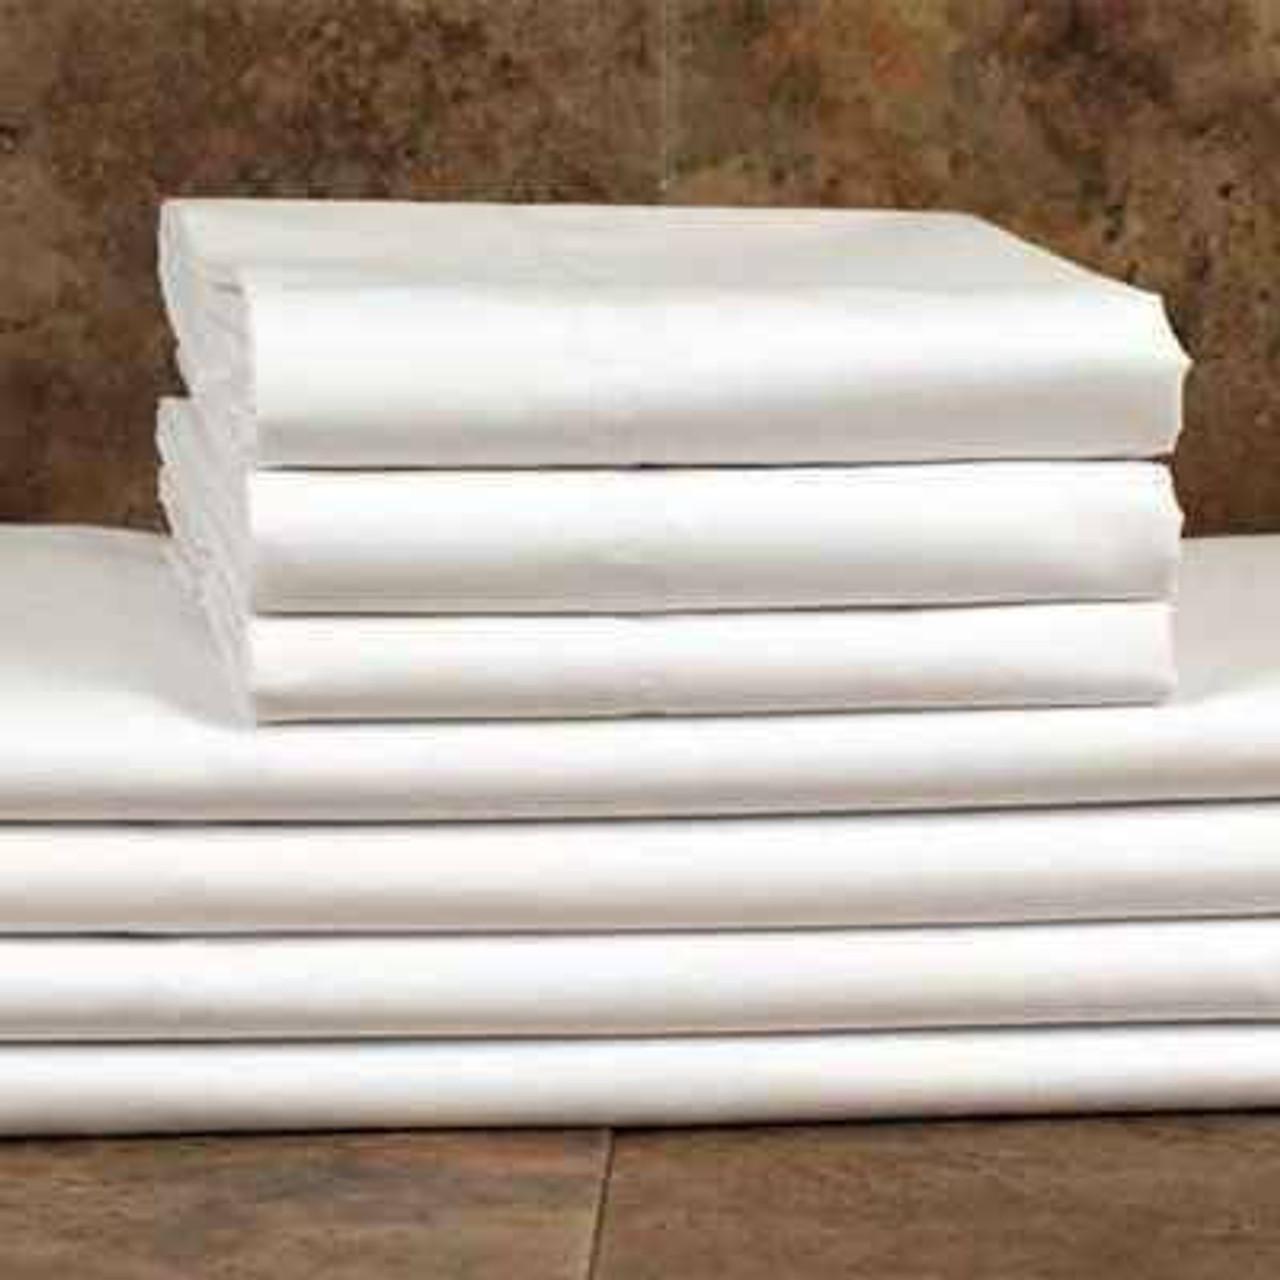 1888 Mills 1888 Mills or Oasis or Duvet Covers or Pack of 6